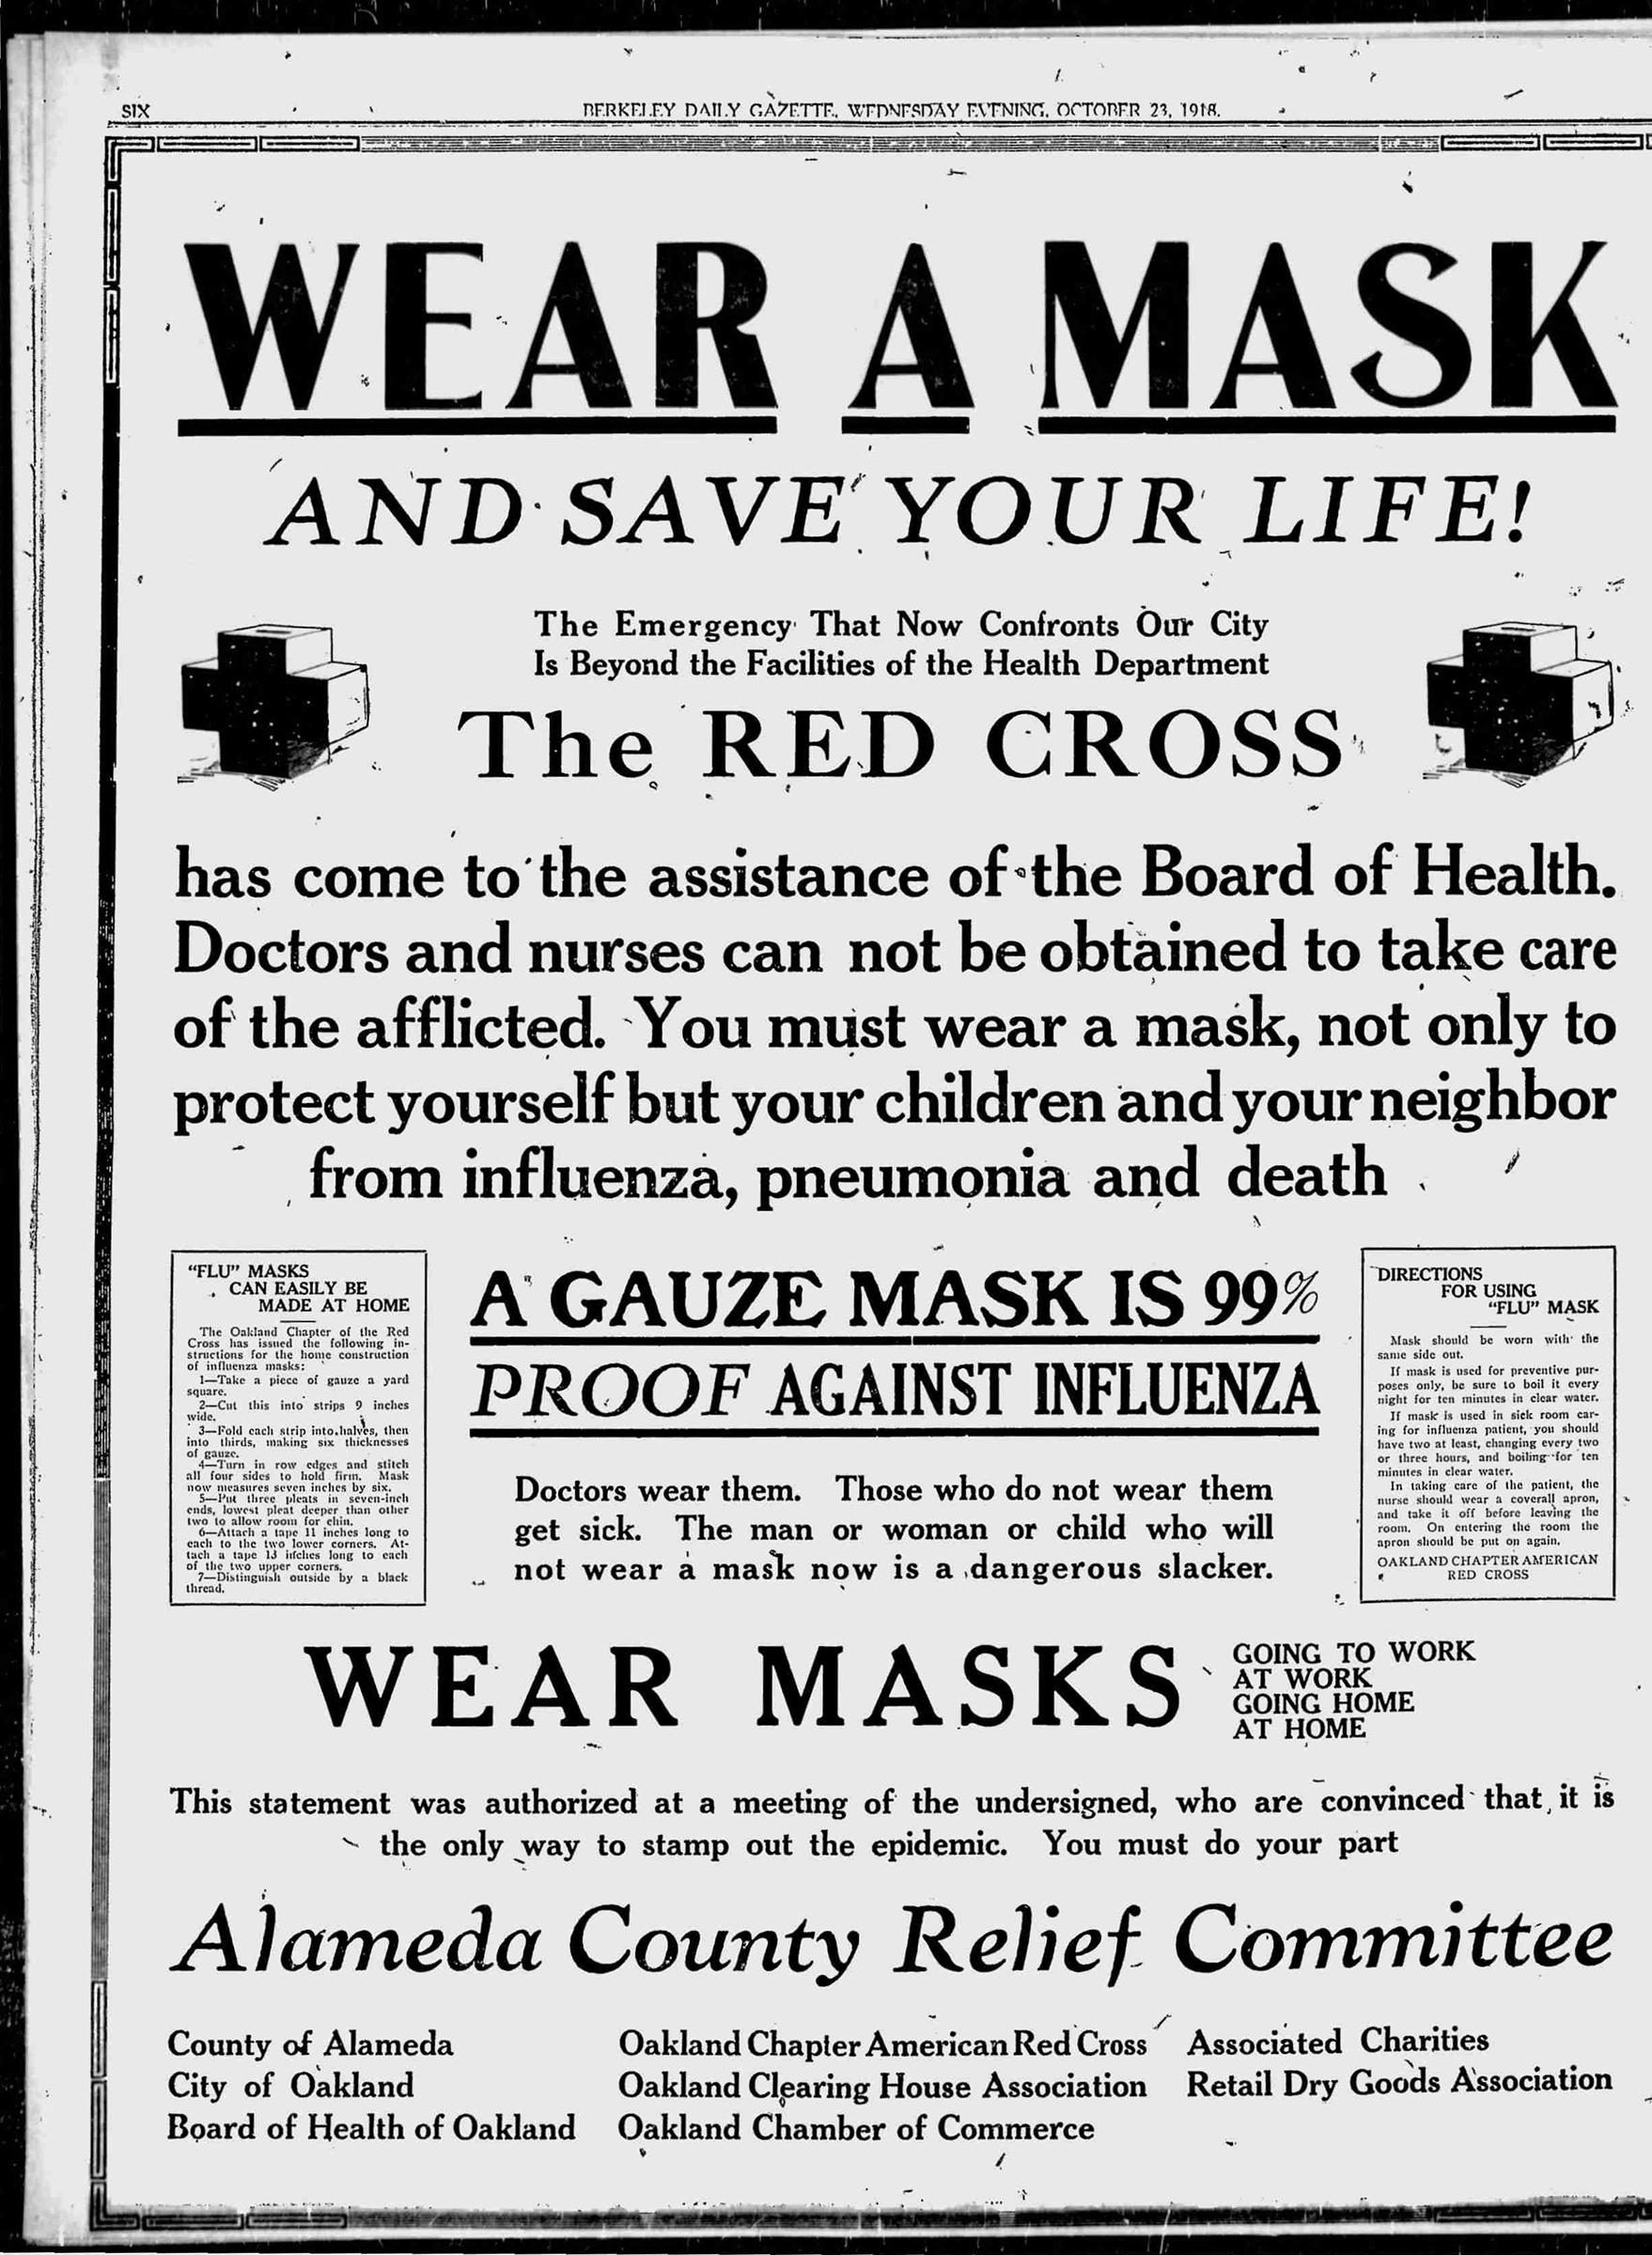 Newspaper Ads on the Spanish Flu Echo Coronavirus Messaging   Time